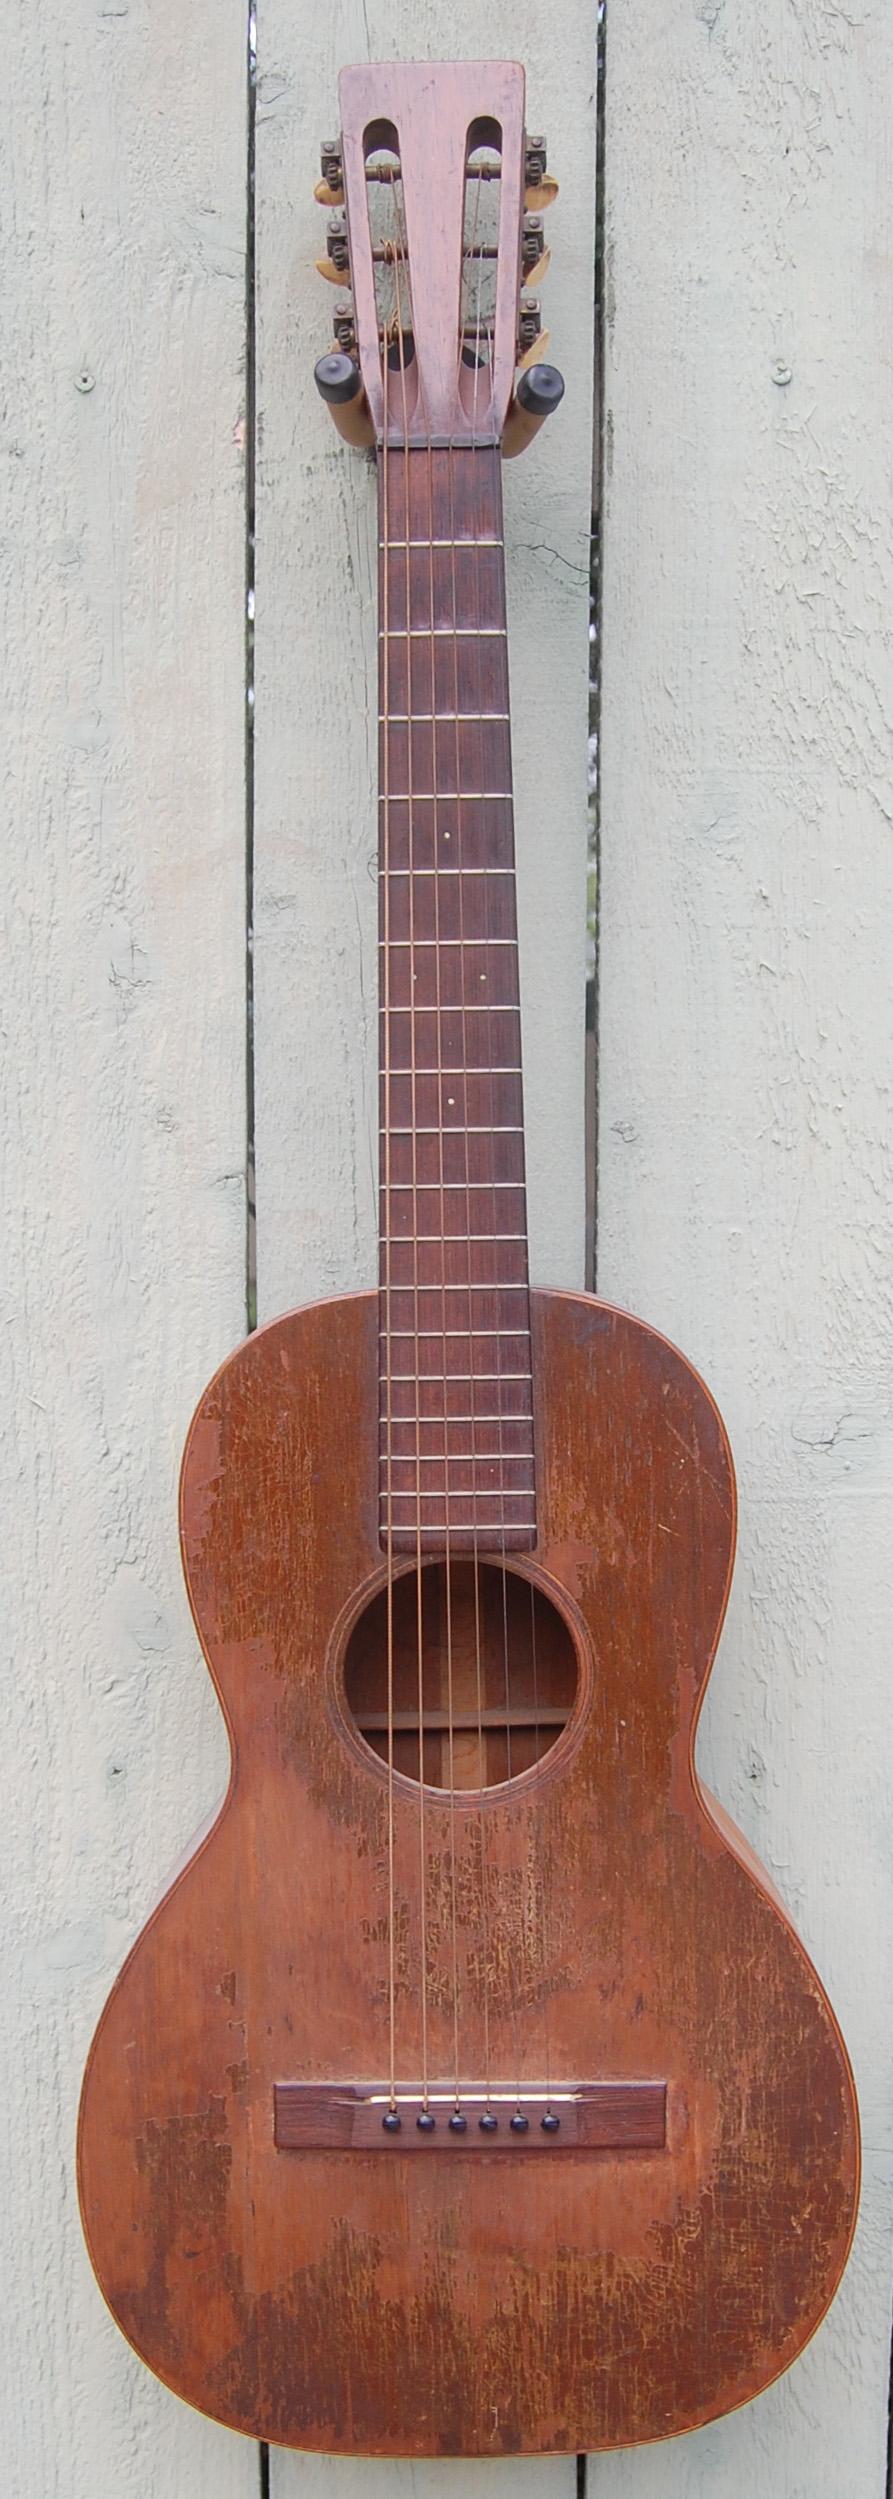 1930 2-17